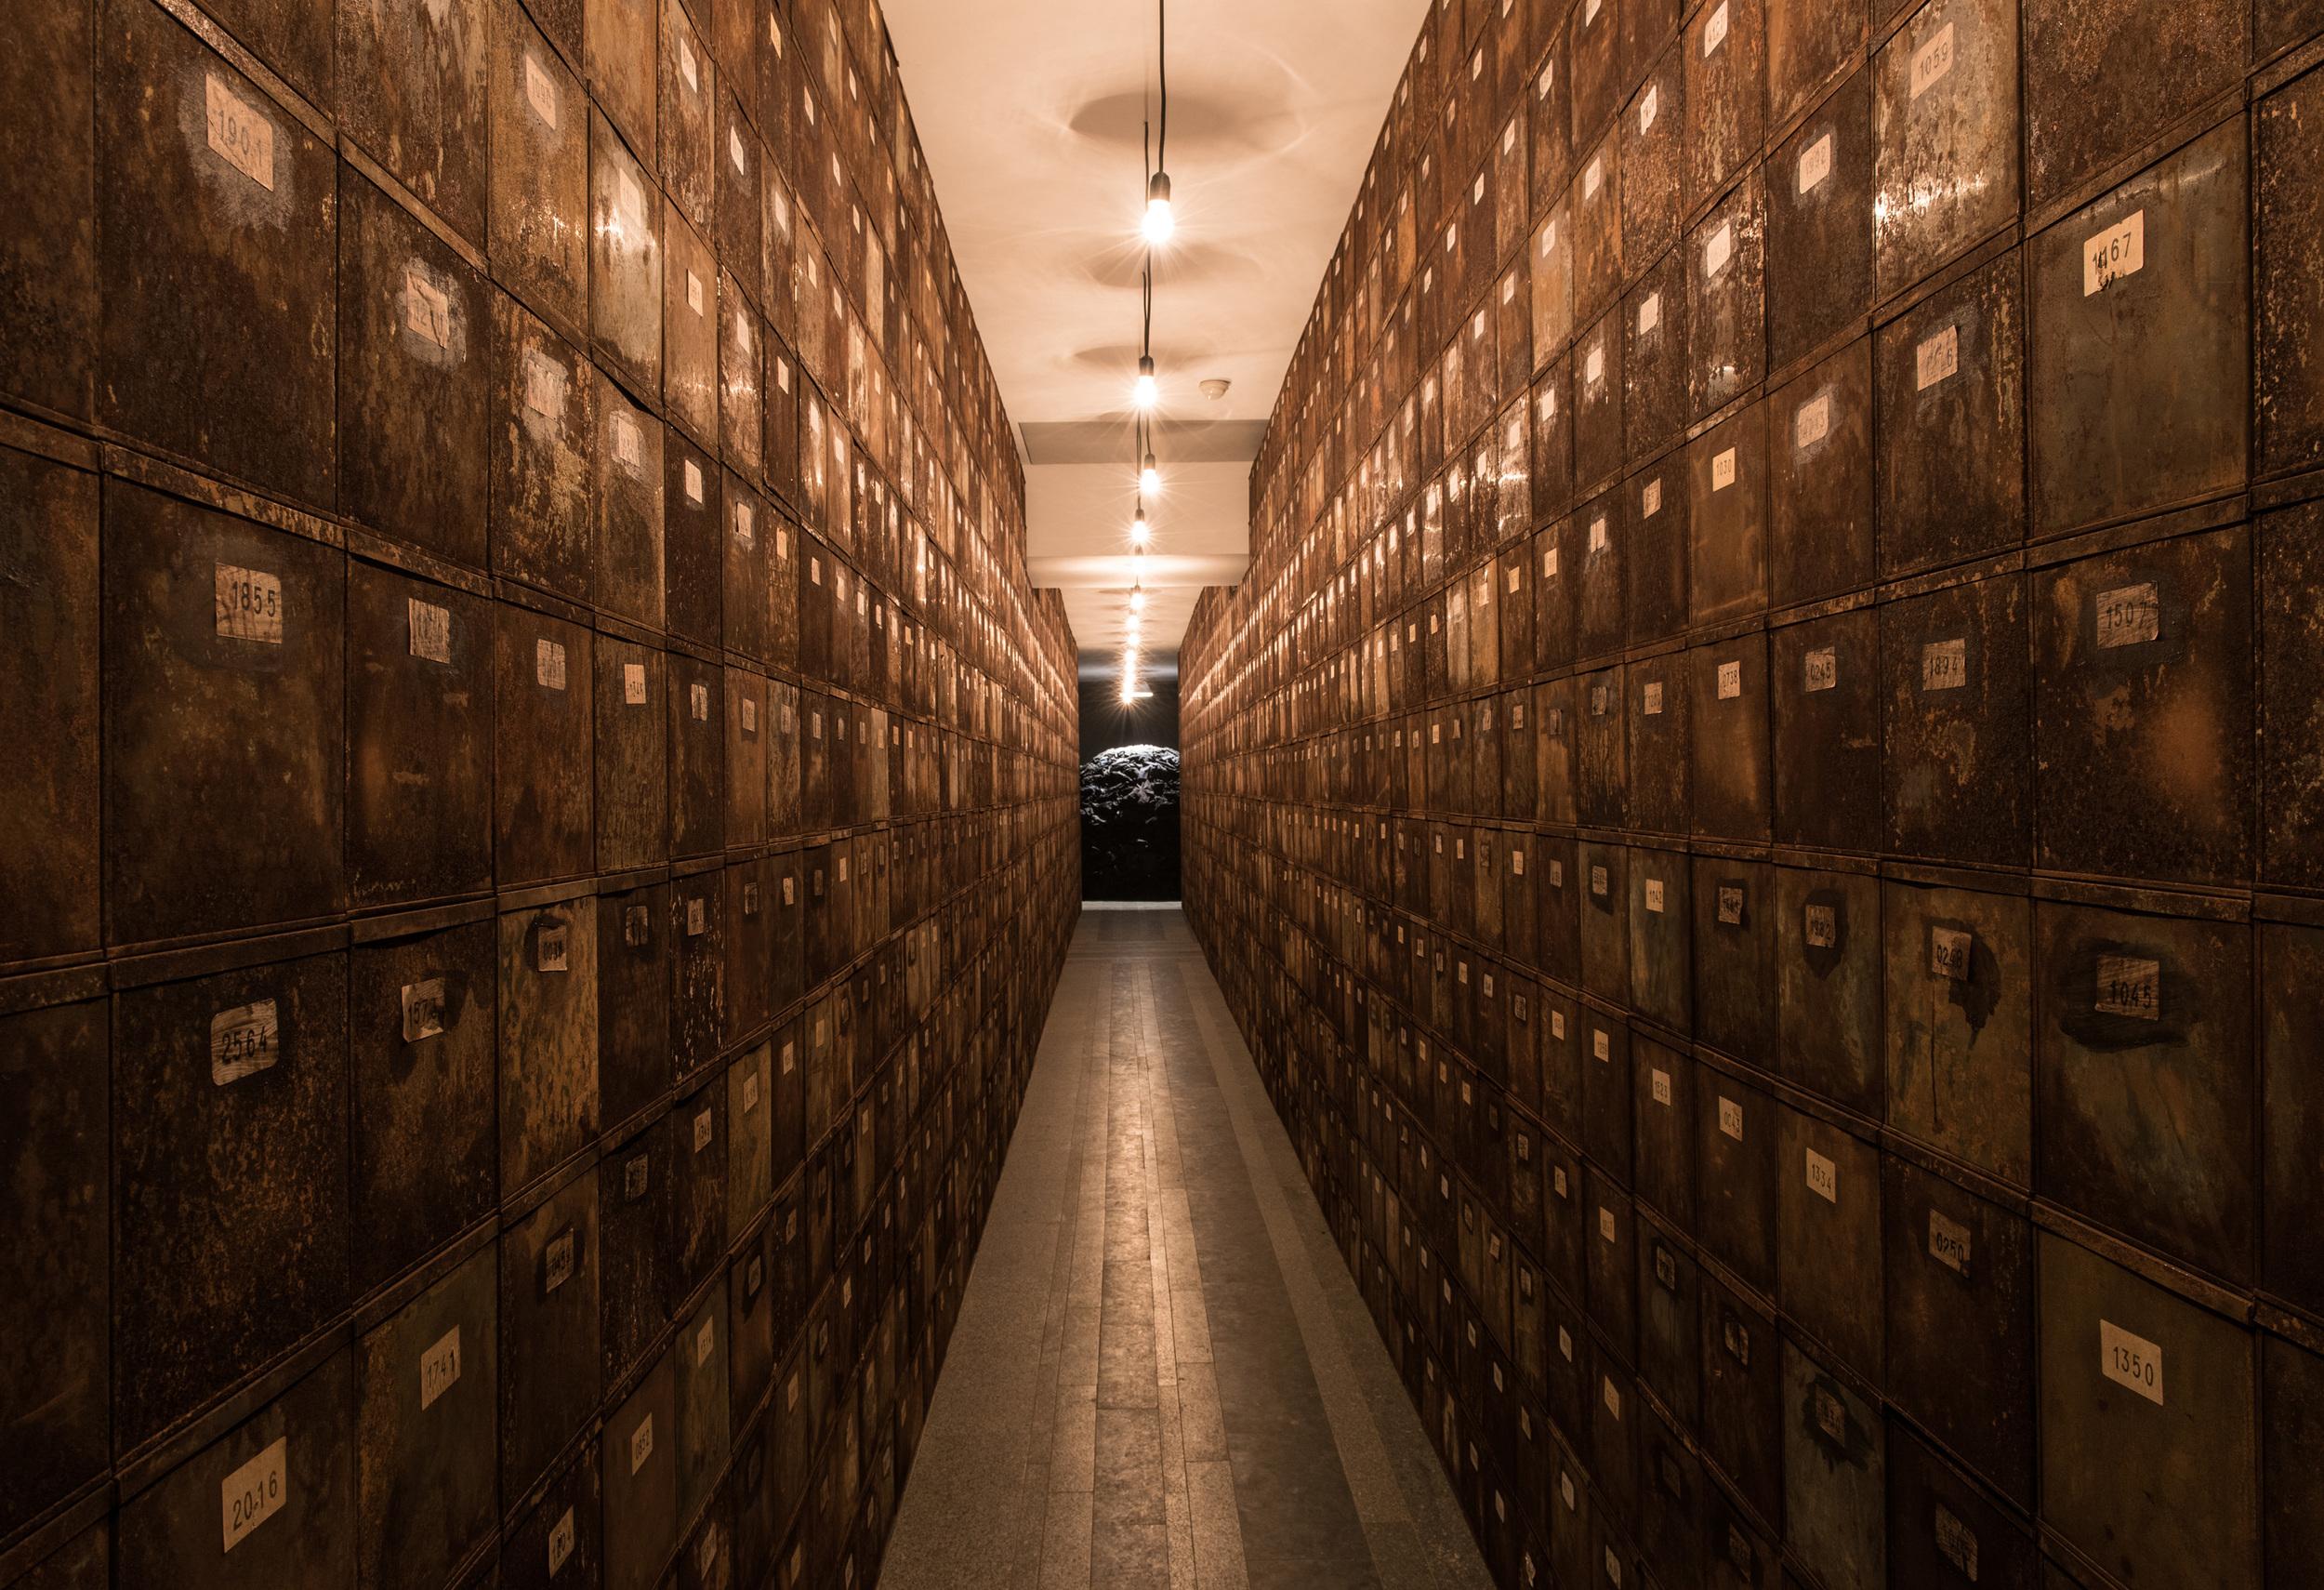 Christian Boltanski. Le Chemin de Babi Yar / The Path of Babi Yar, 2016 Courtesy of the artist